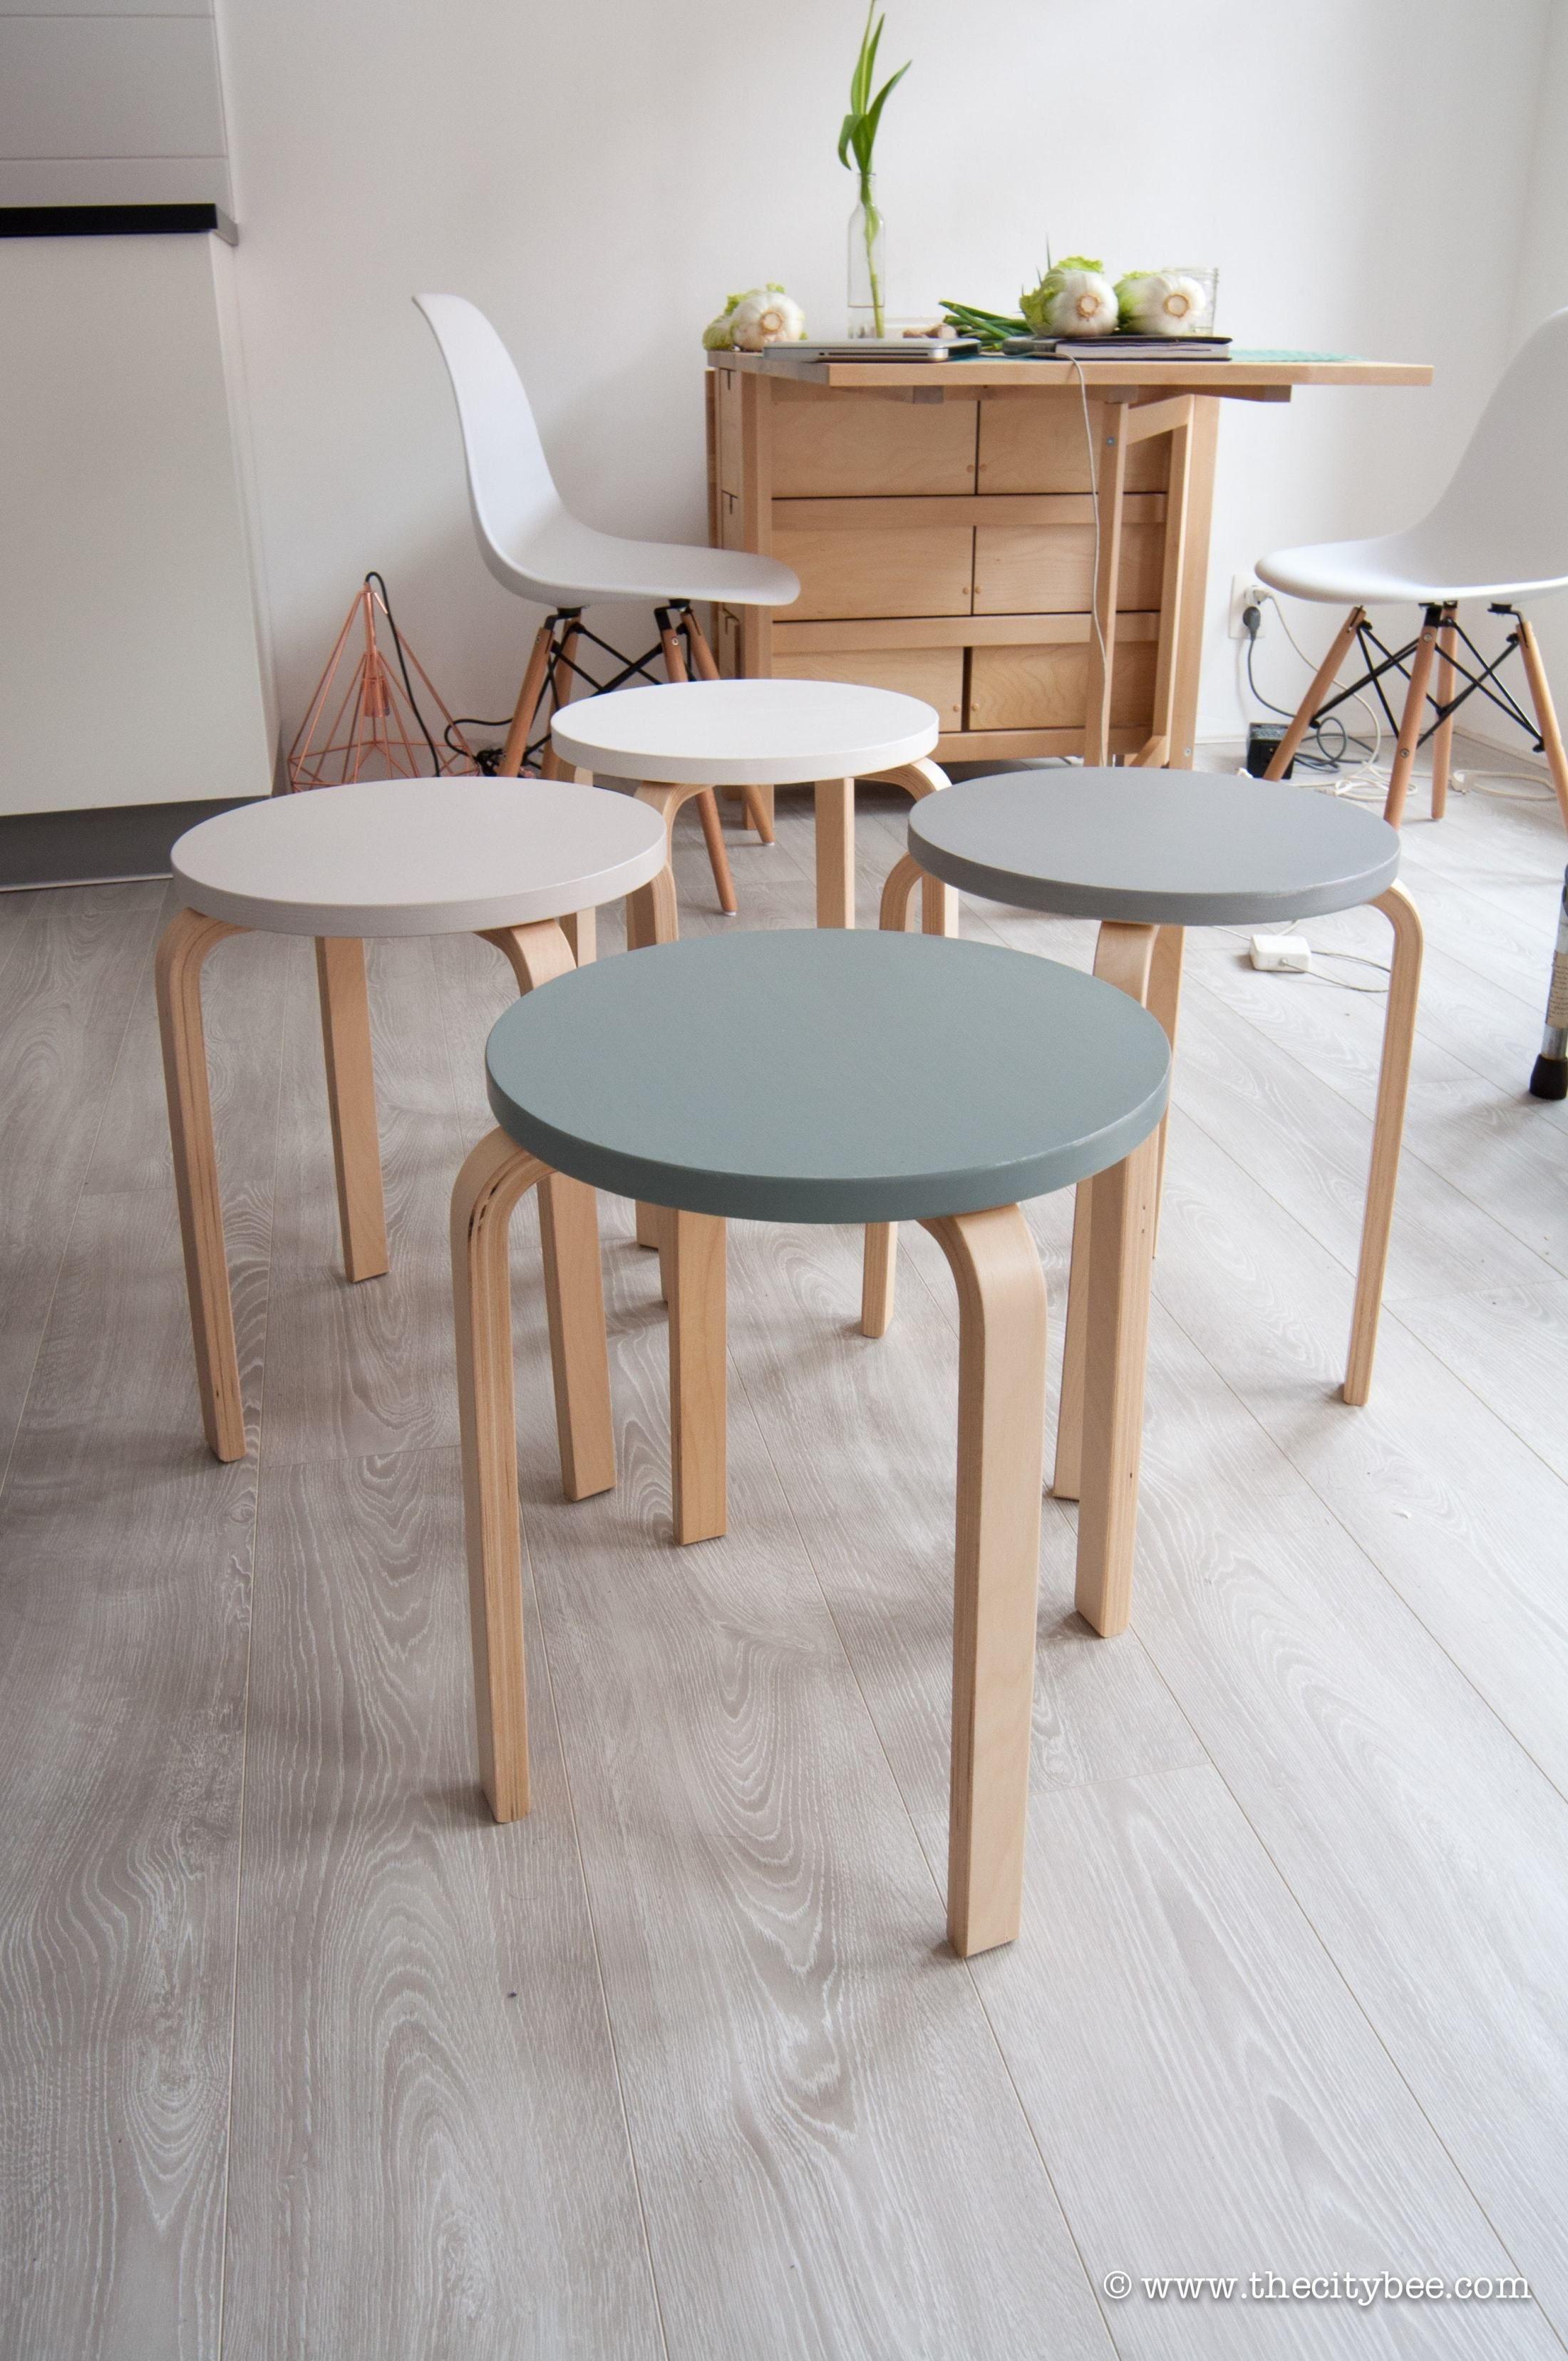 Easy Scandinavian Ikea Frosta Stool Makeover Ikea Inspiration Stool Makeover Ikea Diy